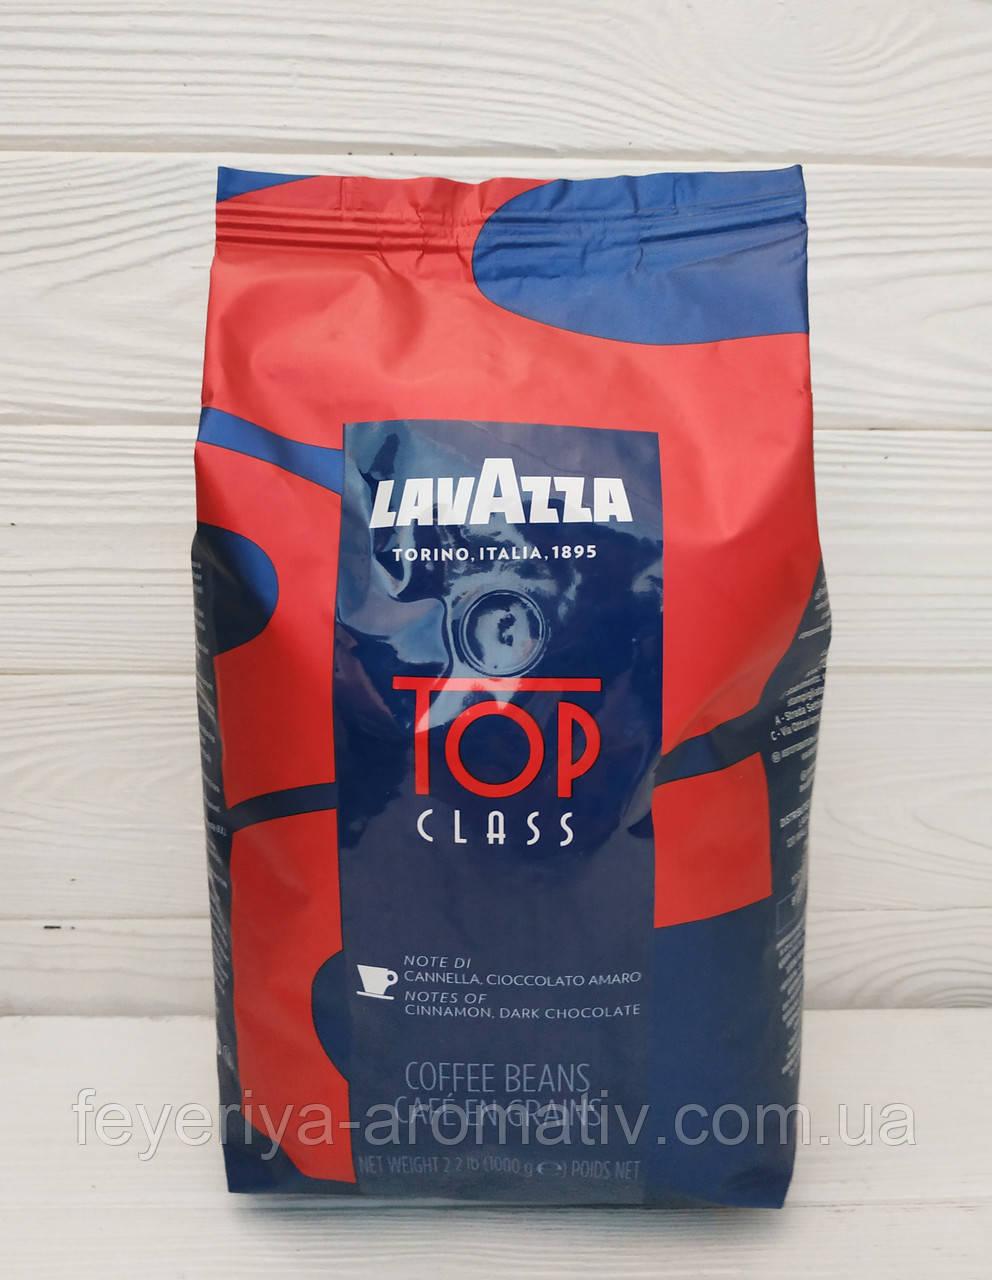 Кофе в зернах Lavazza Top Class Espresso 1кг. (Италия)